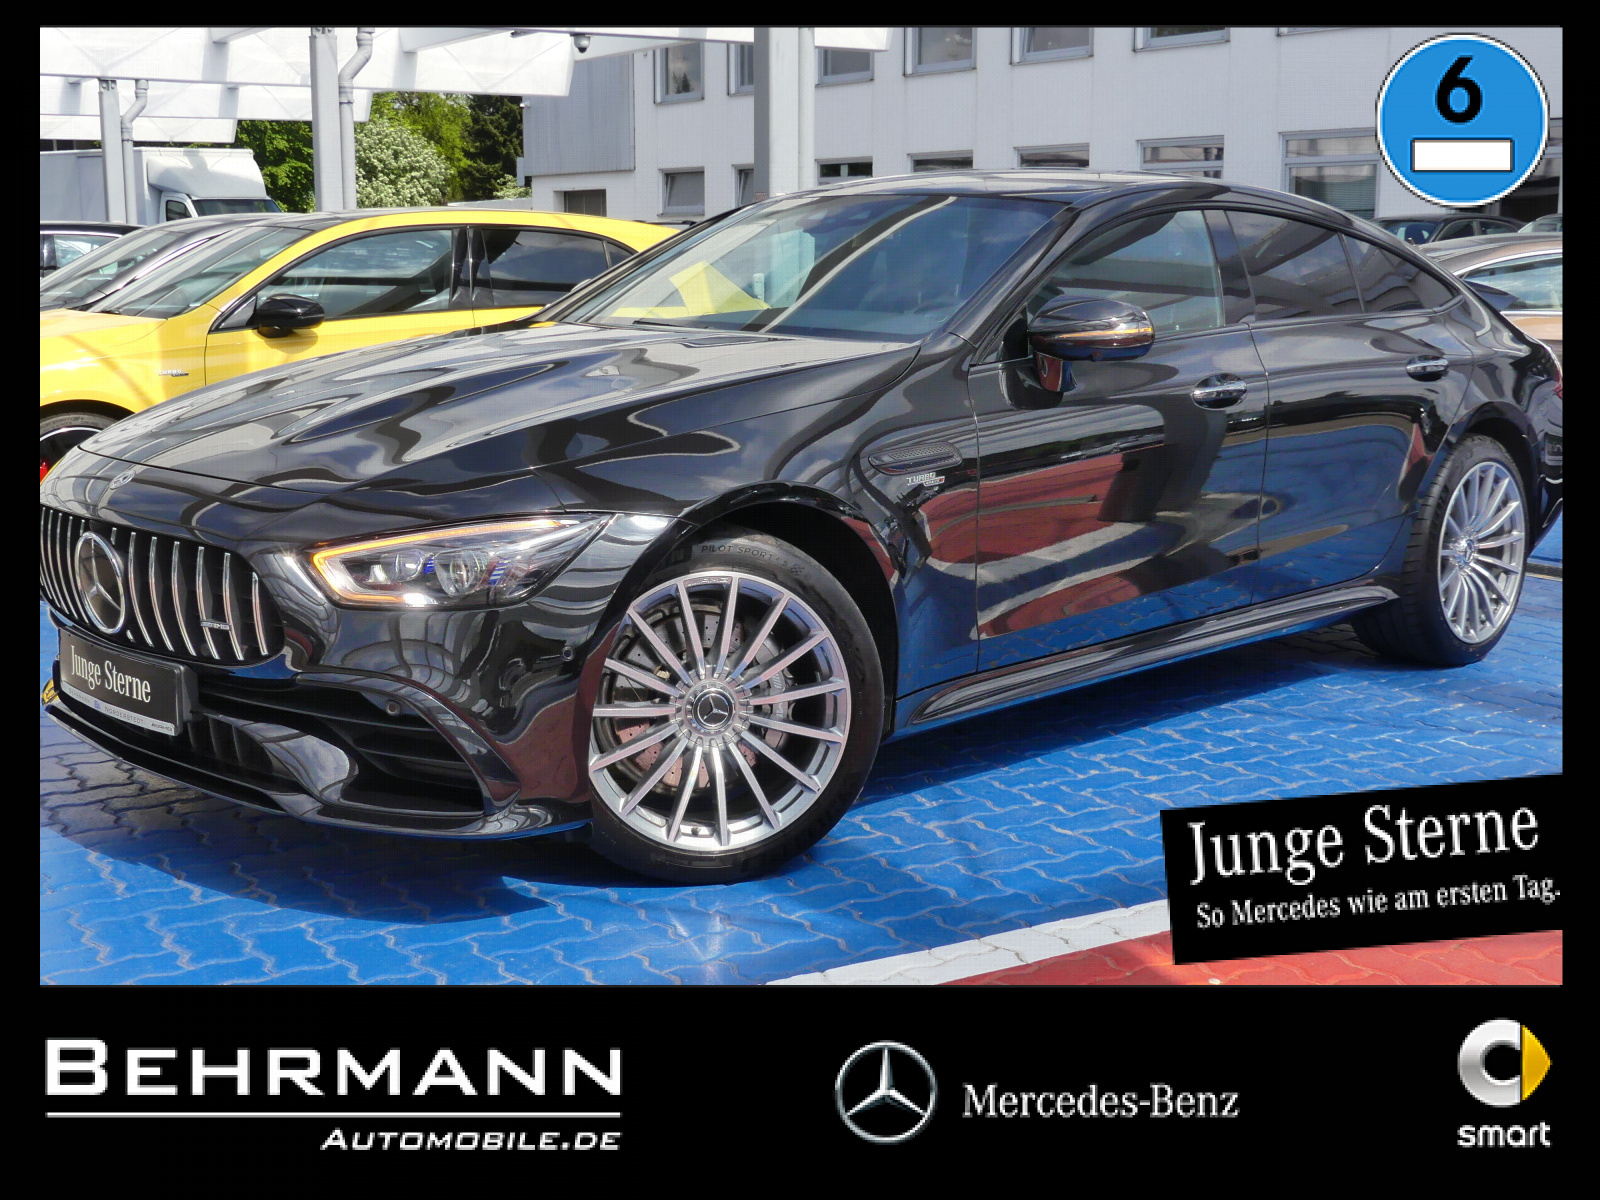 Mercedes-Benz AMG GT 43 4M ++Distronic+360°Kam+Burmester+LED++, Jahr 2019, Benzin